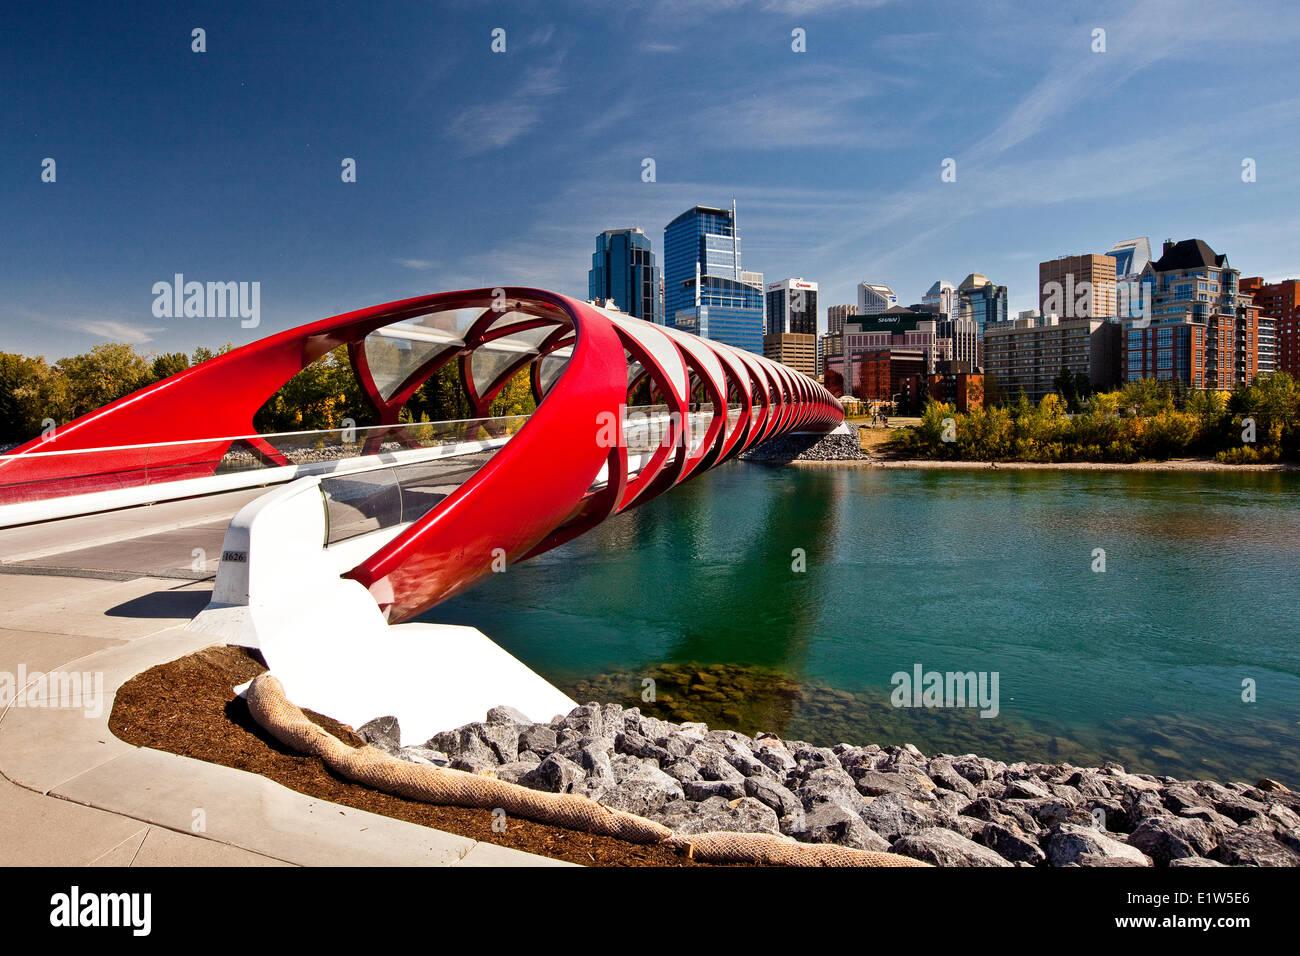 Friedensbrücke Calgary downtown Hochhäuser (Peace Bridge ist eine Fußgängerbrücke, die Stockbild